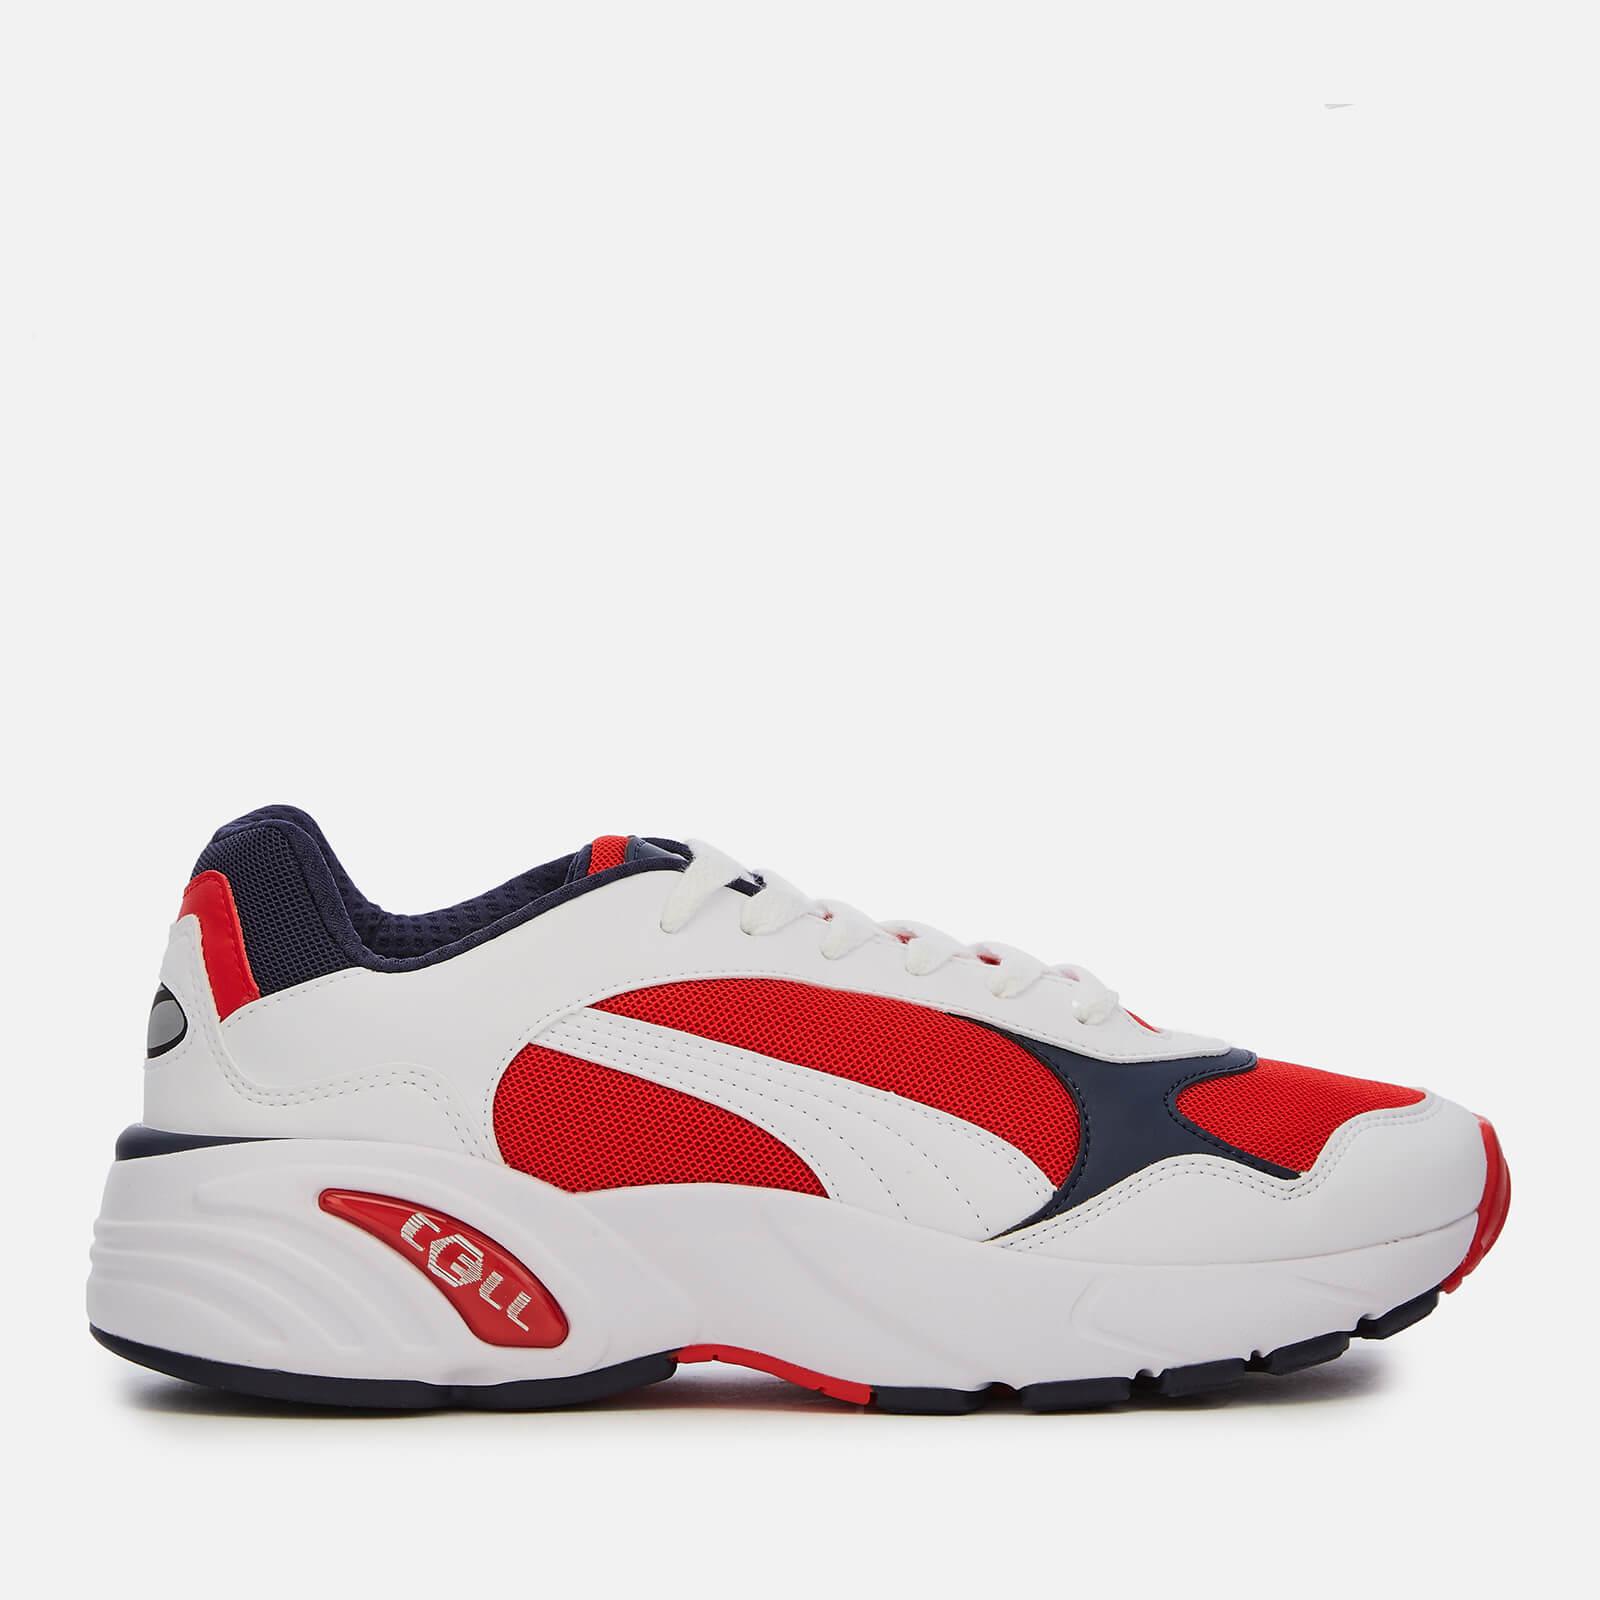 a528c53983 Puma Men s Cell Viper Trainers - Puma White High Risk Red Mens Footwear